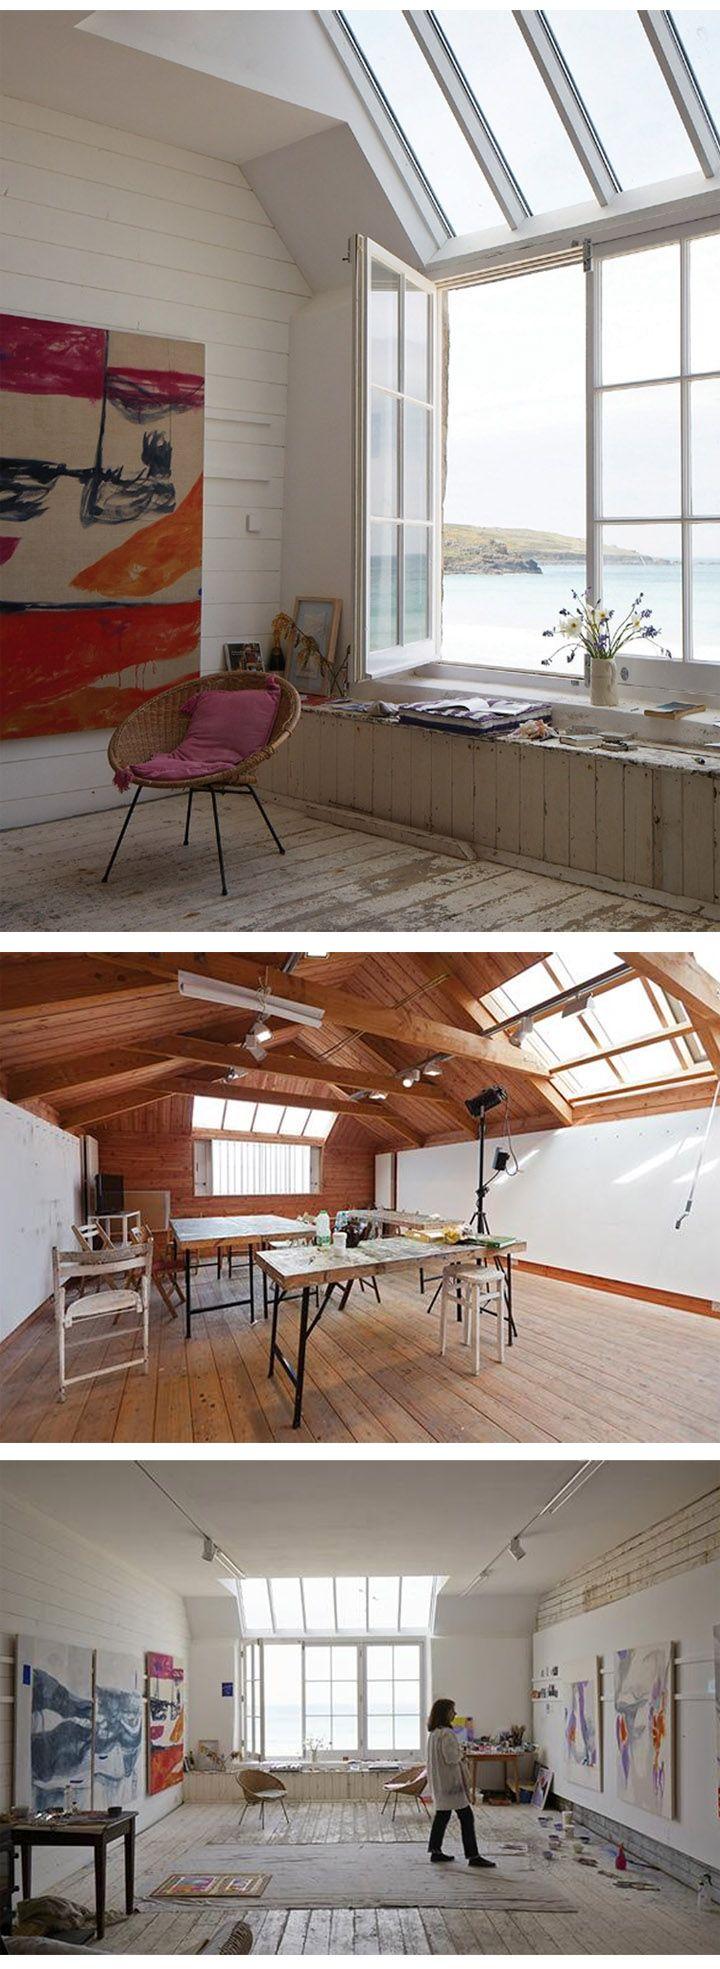 Porthmeor Studios, St Ives     http://www.bdonline.co.uk/porthmeor-studios-st-ives-by-long-and-kentish/5060425.article